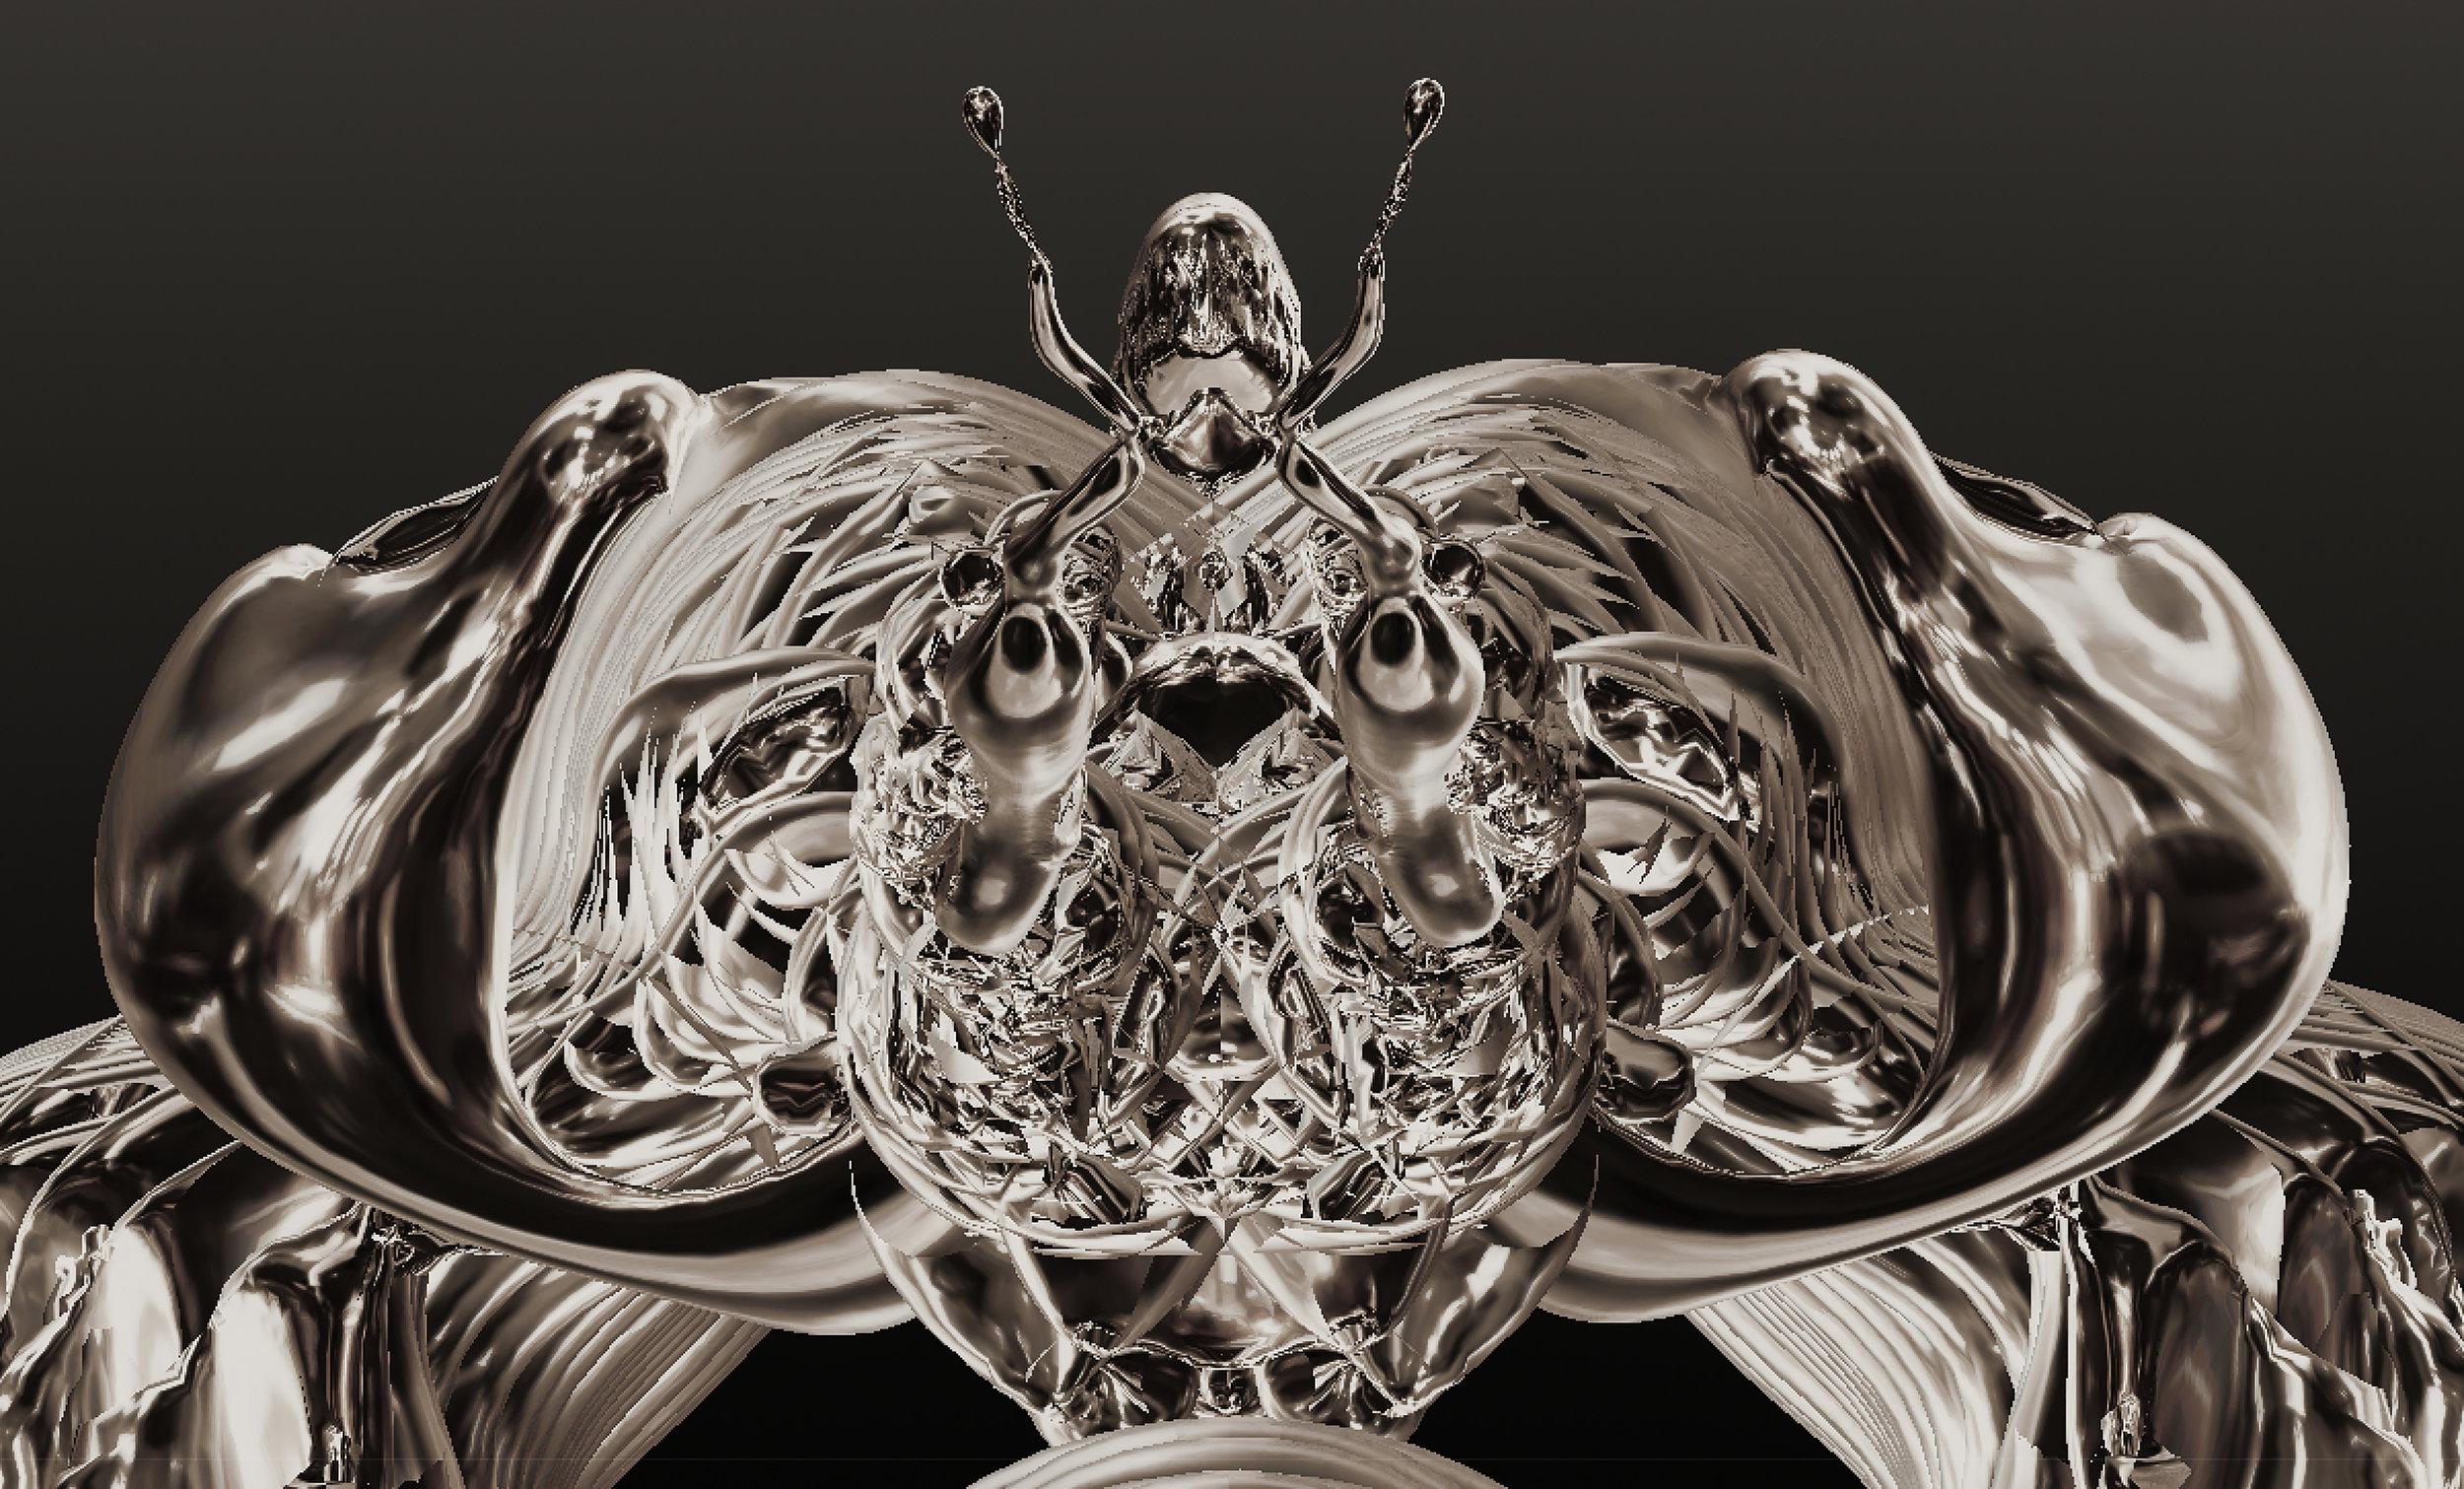 Digital sculpture